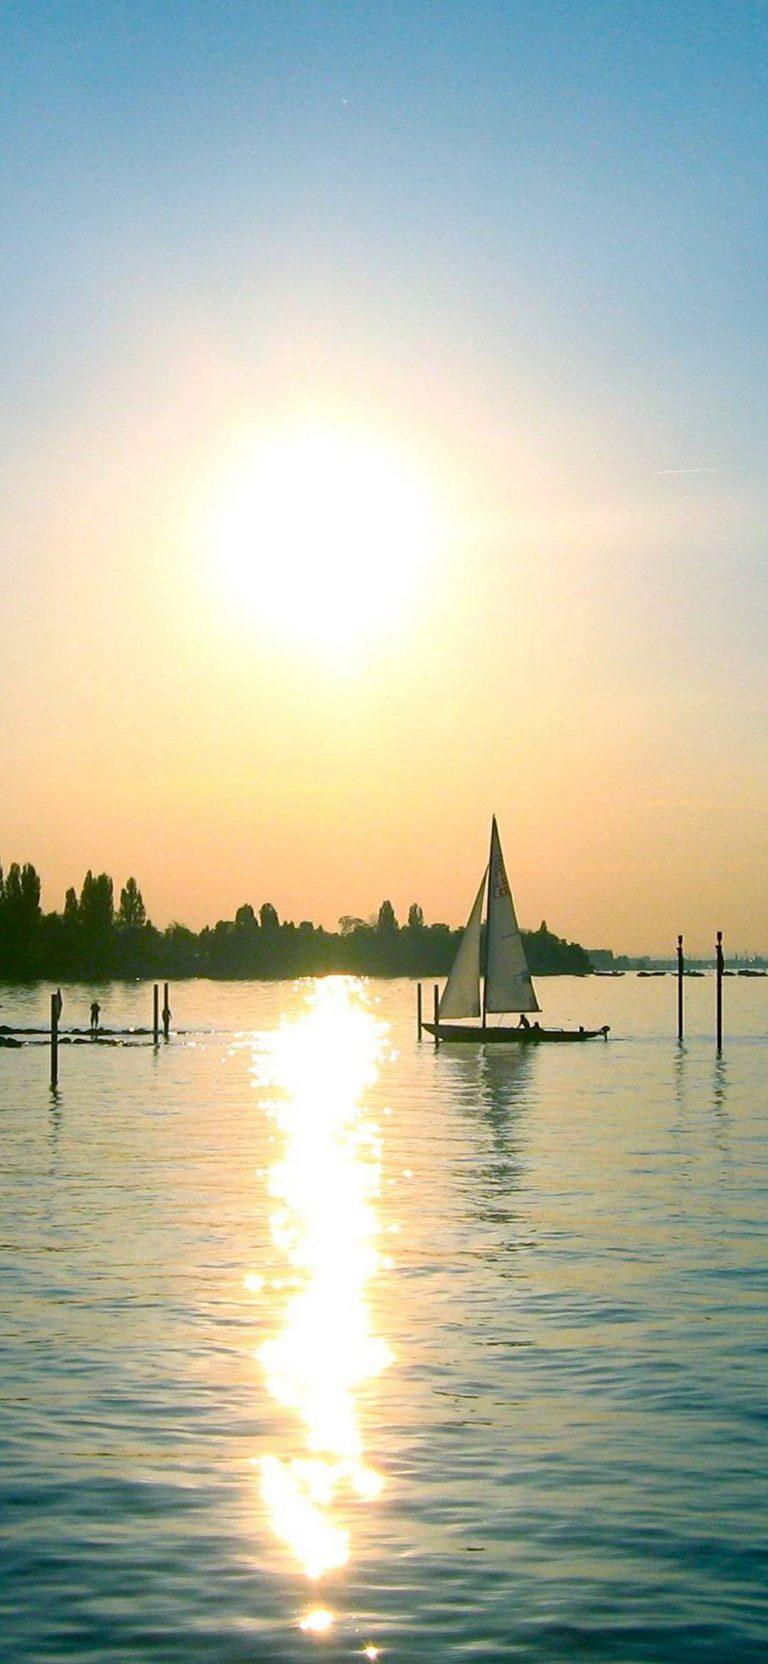 Sunset The Sailboat 1080x2340 768x1664